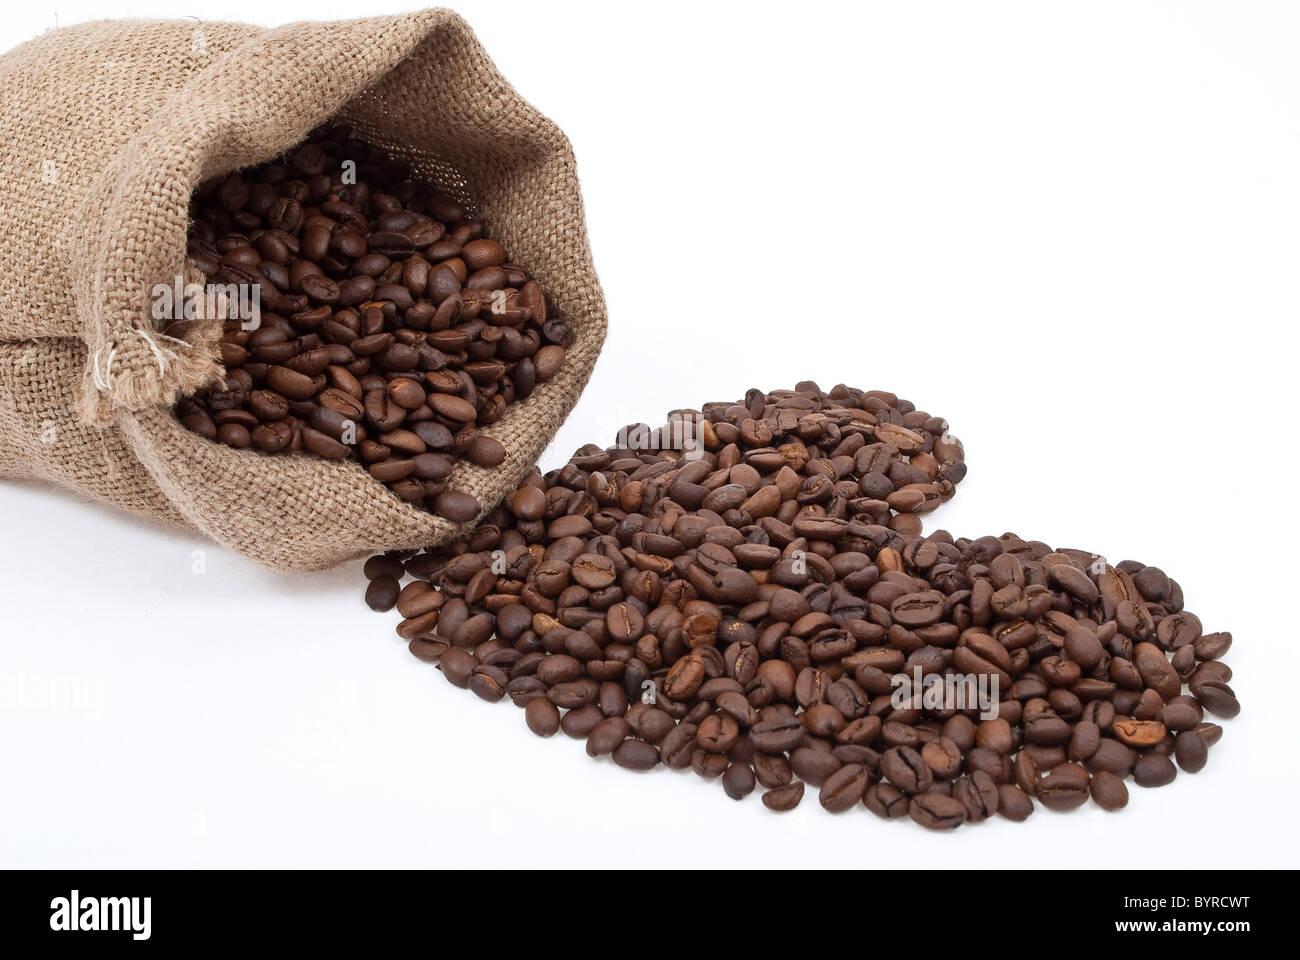 Burlap sack with coffee heart - Stock Image